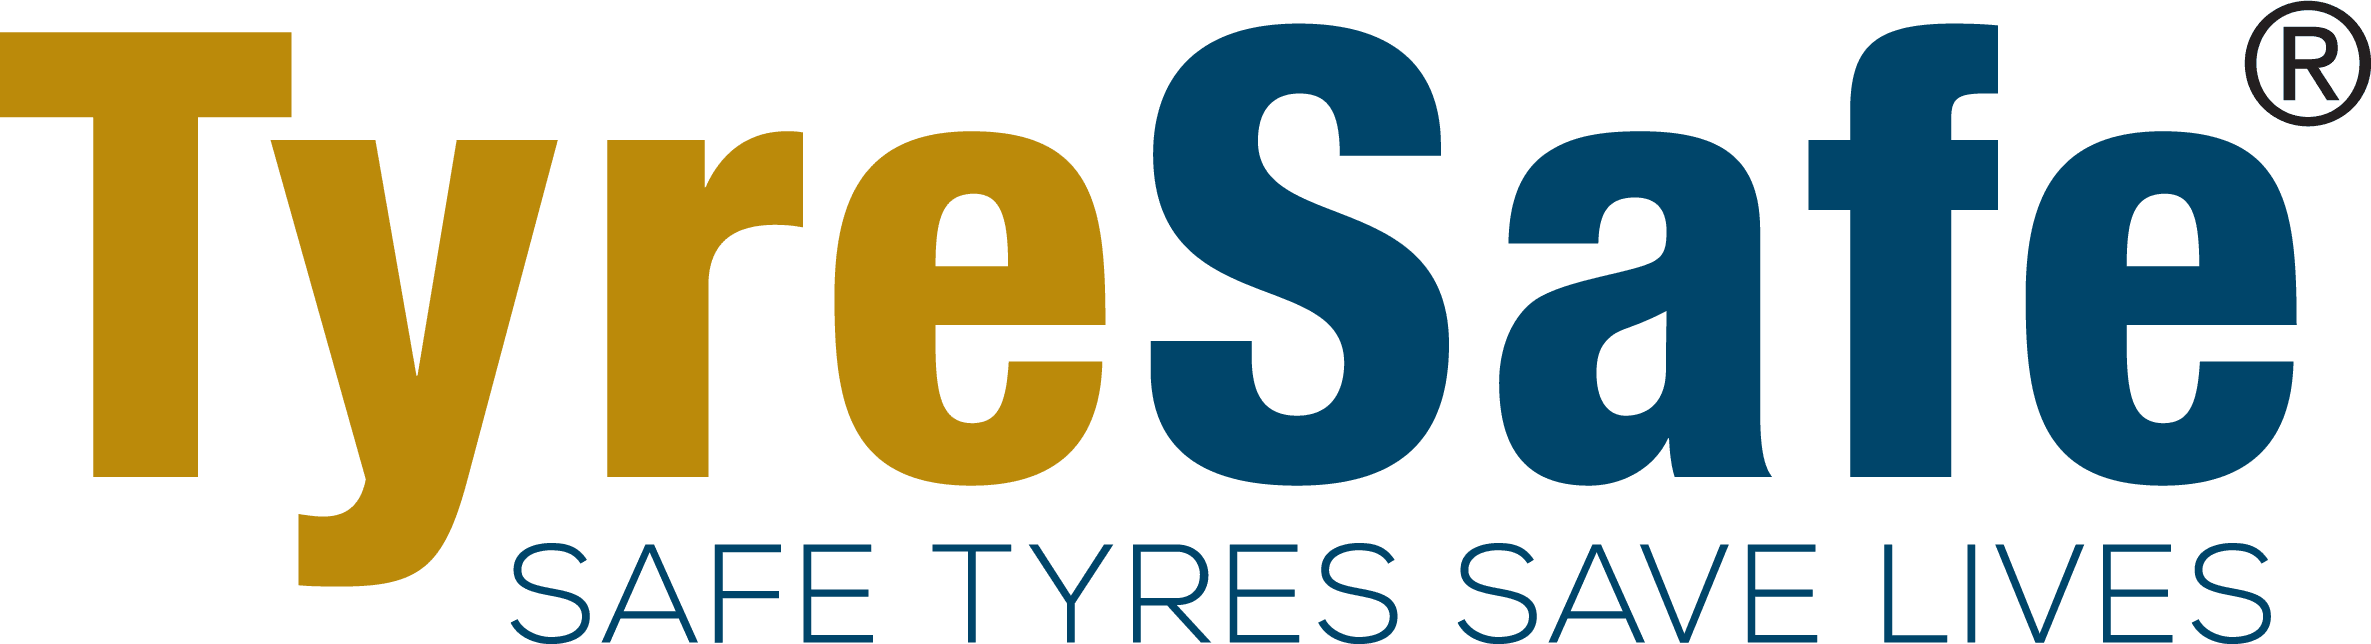 1 tyre safe logo